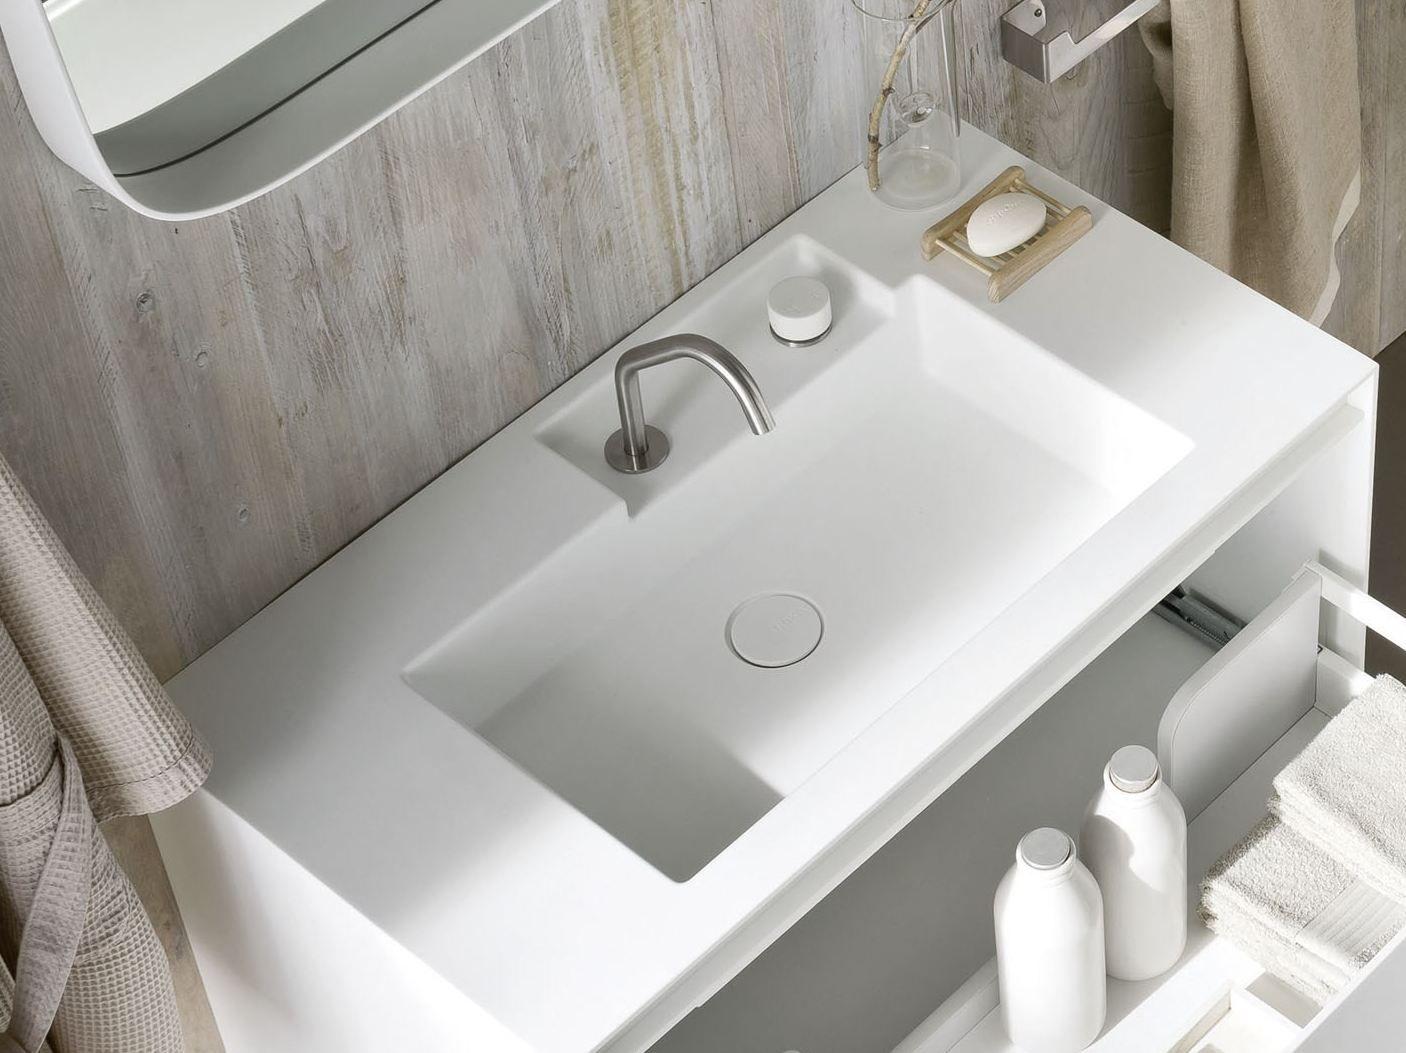 ergo nomic robinet pour lavabo by rexa design design giulio gianturco. Black Bedroom Furniture Sets. Home Design Ideas